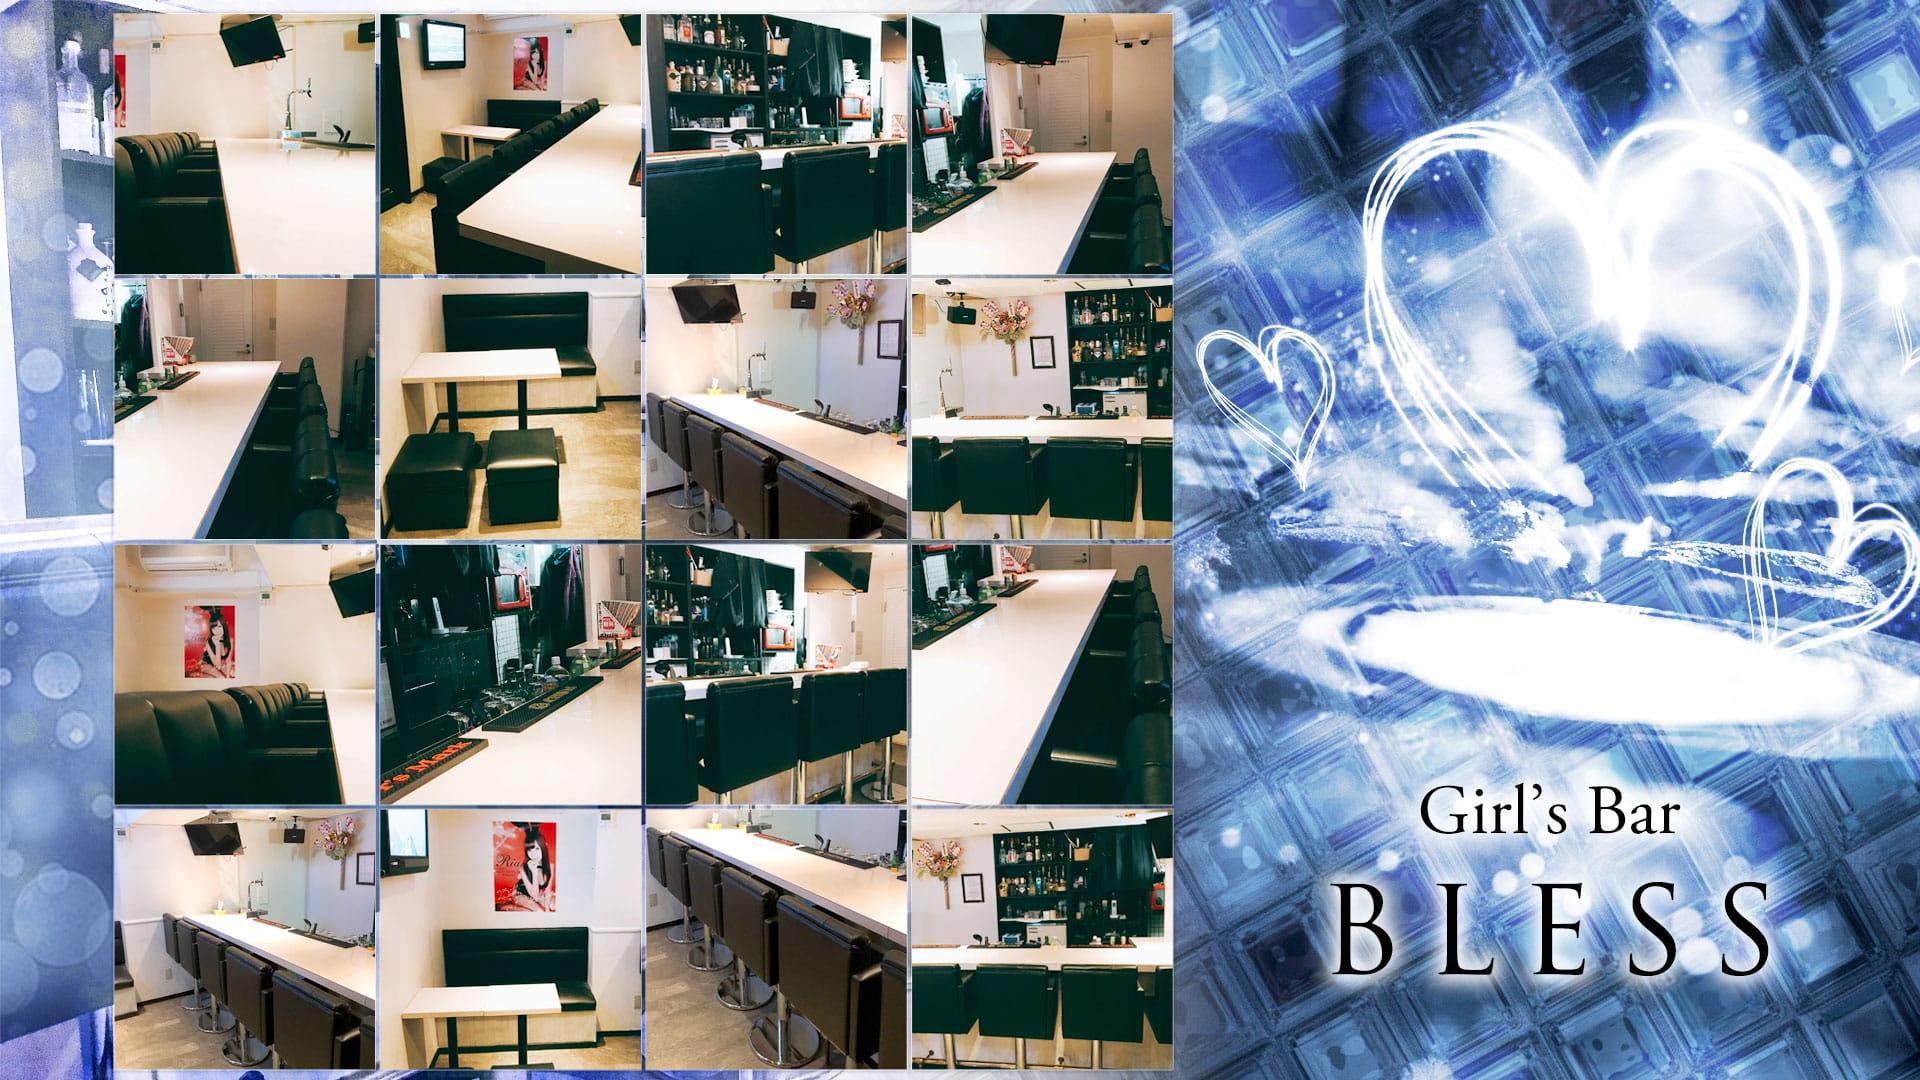 BLESS<ブレス> 歌舞伎町 ガールズバー TOP画像